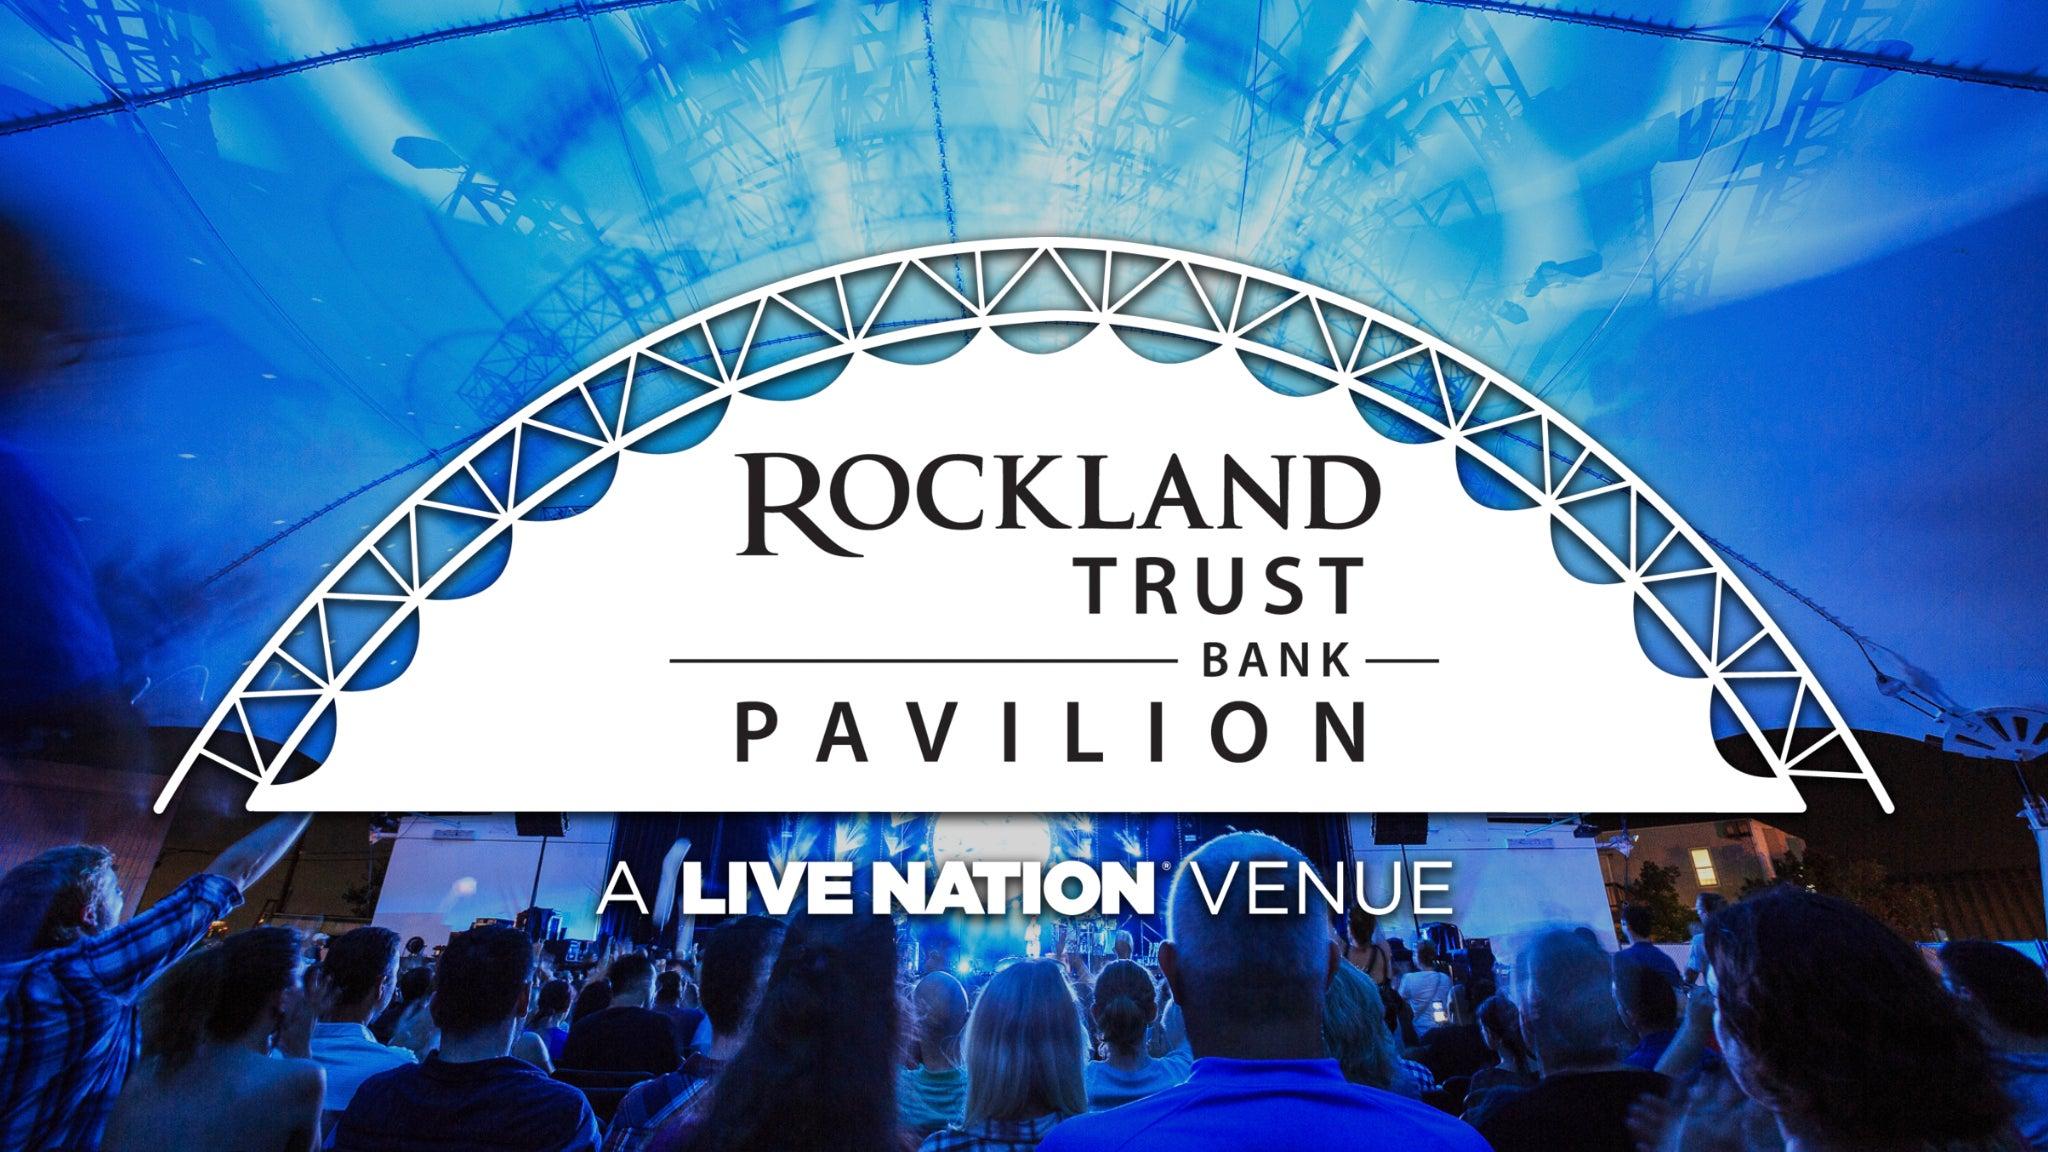 Rockland Trust Bank Pavilion